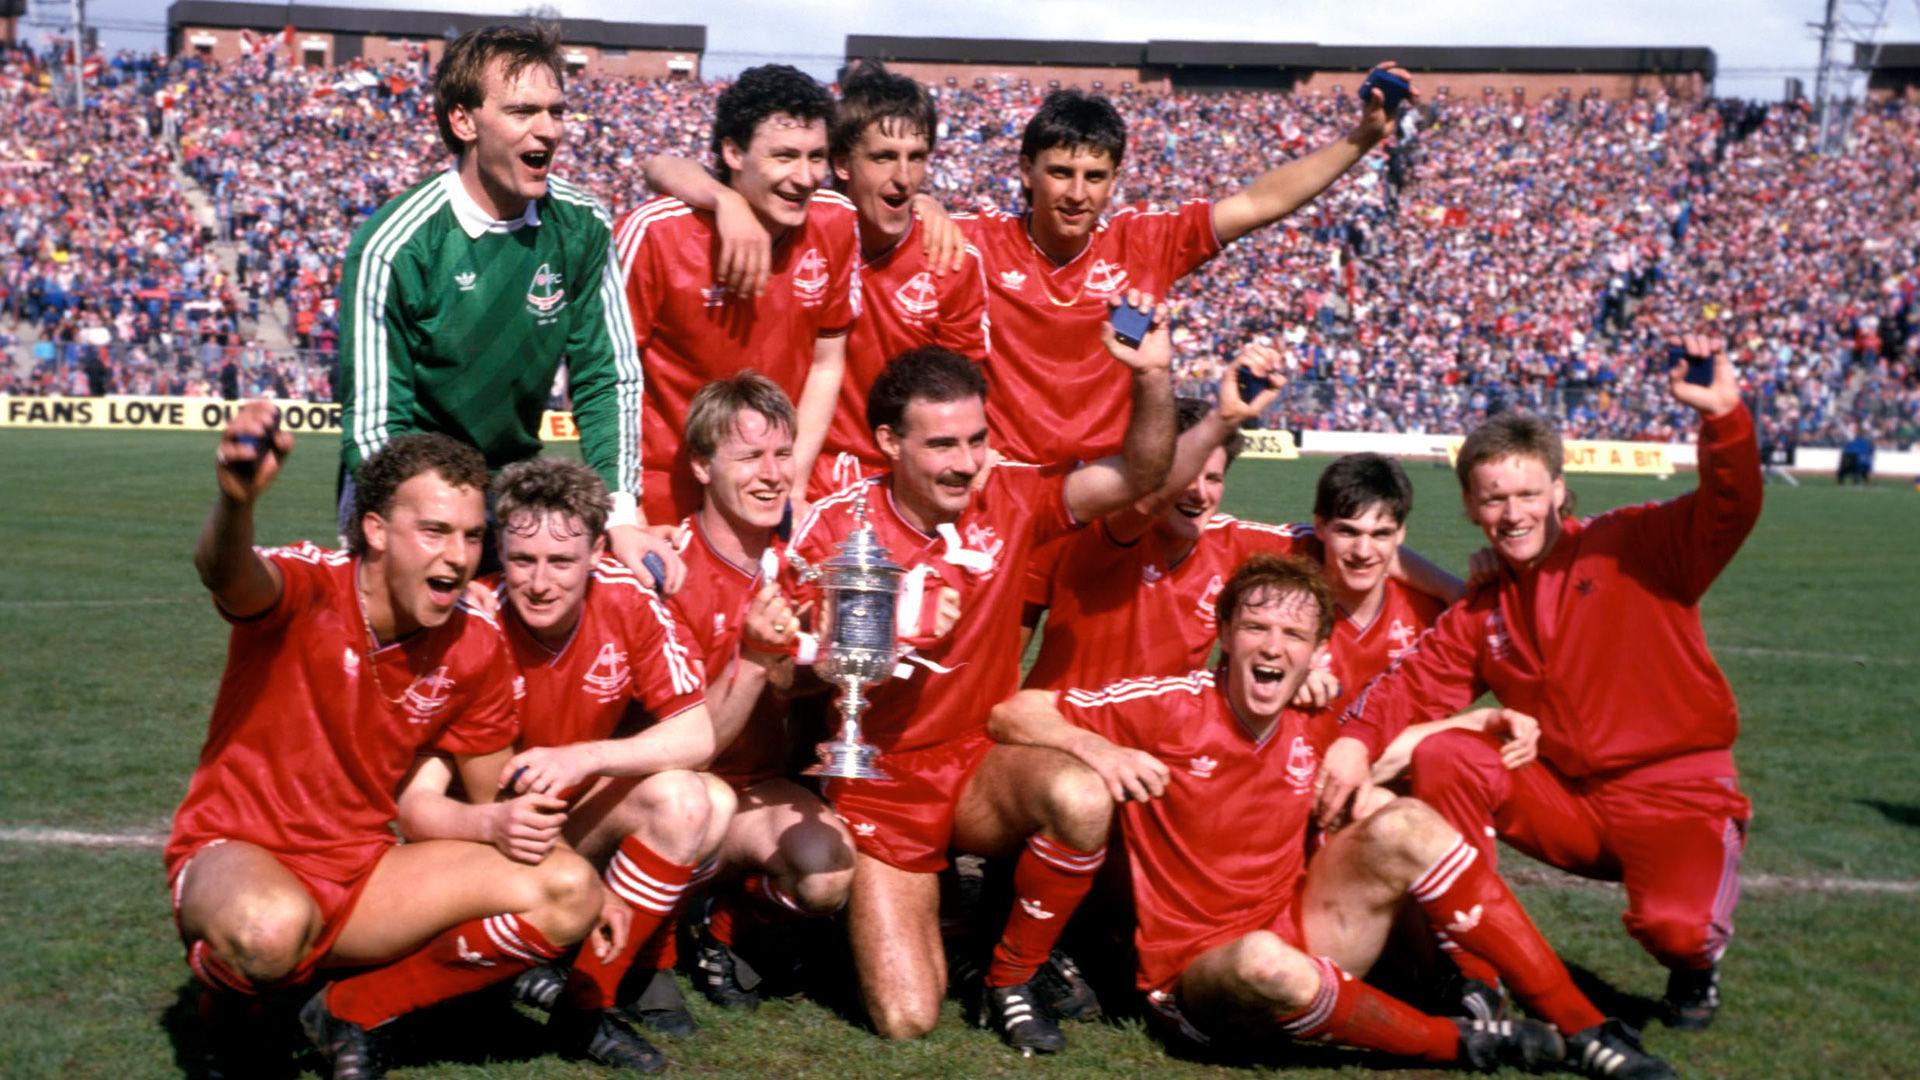 scottish-cup-1985_86_rdax_80